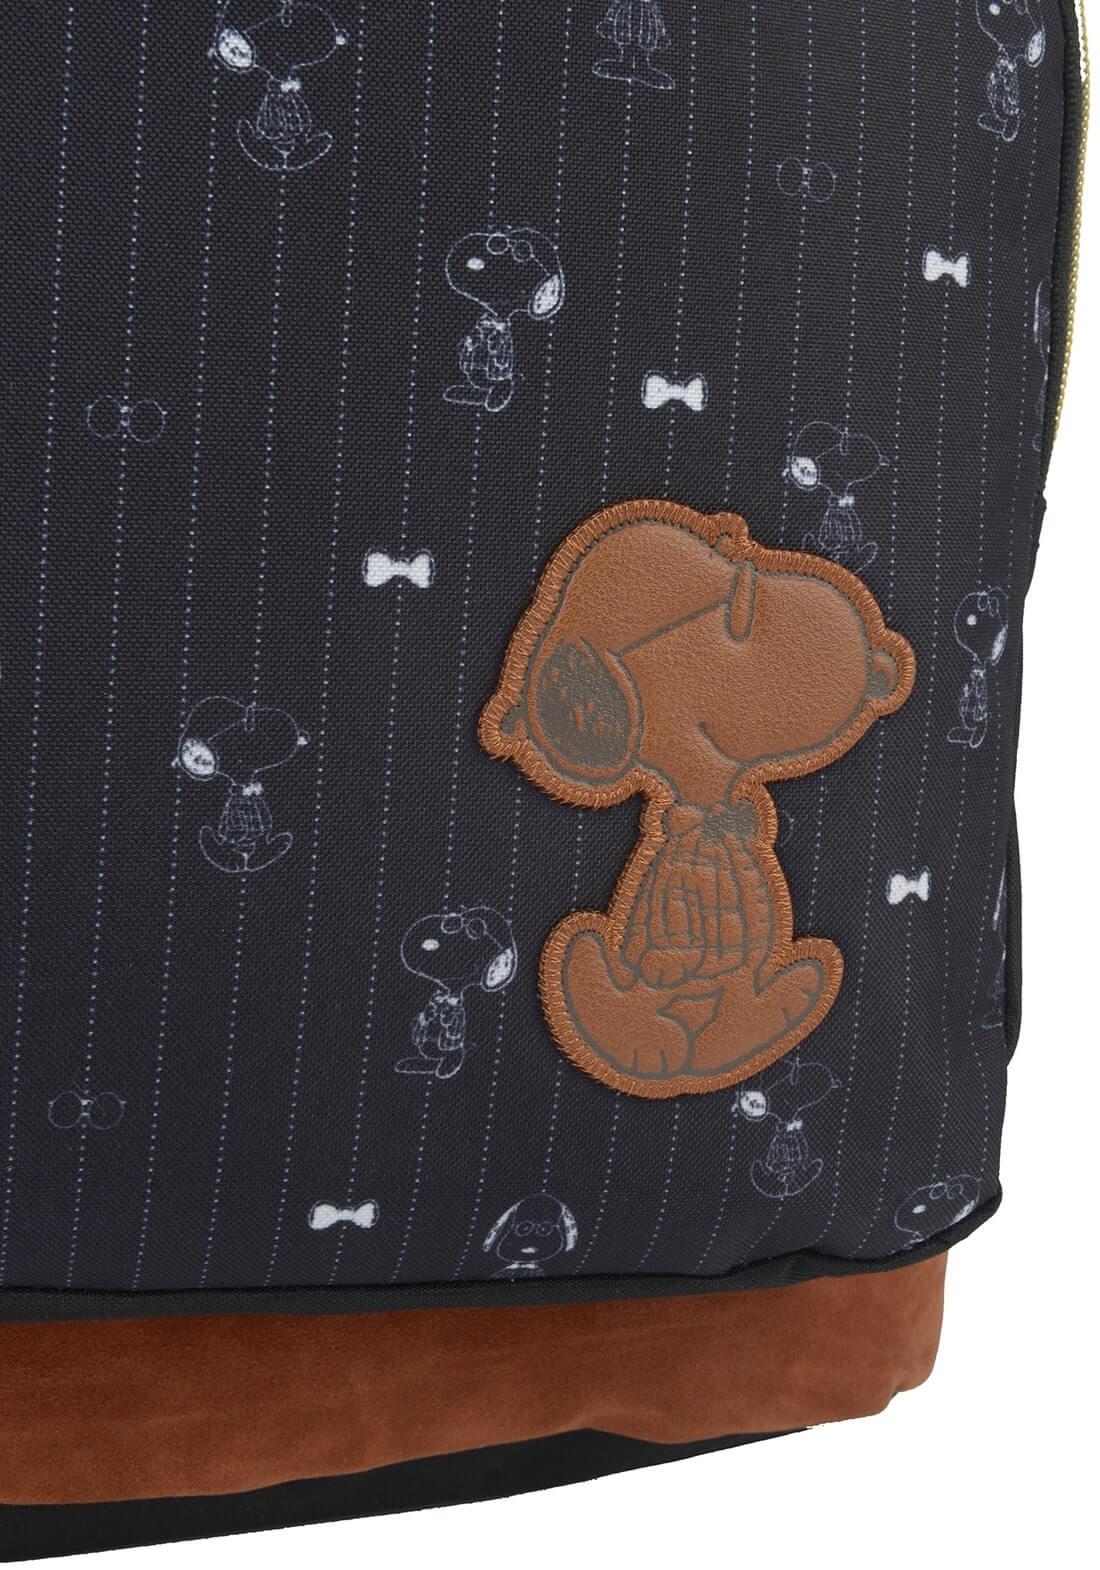 Mochila Peanuts Snoopy Original Chaveiro Notebook  Preta